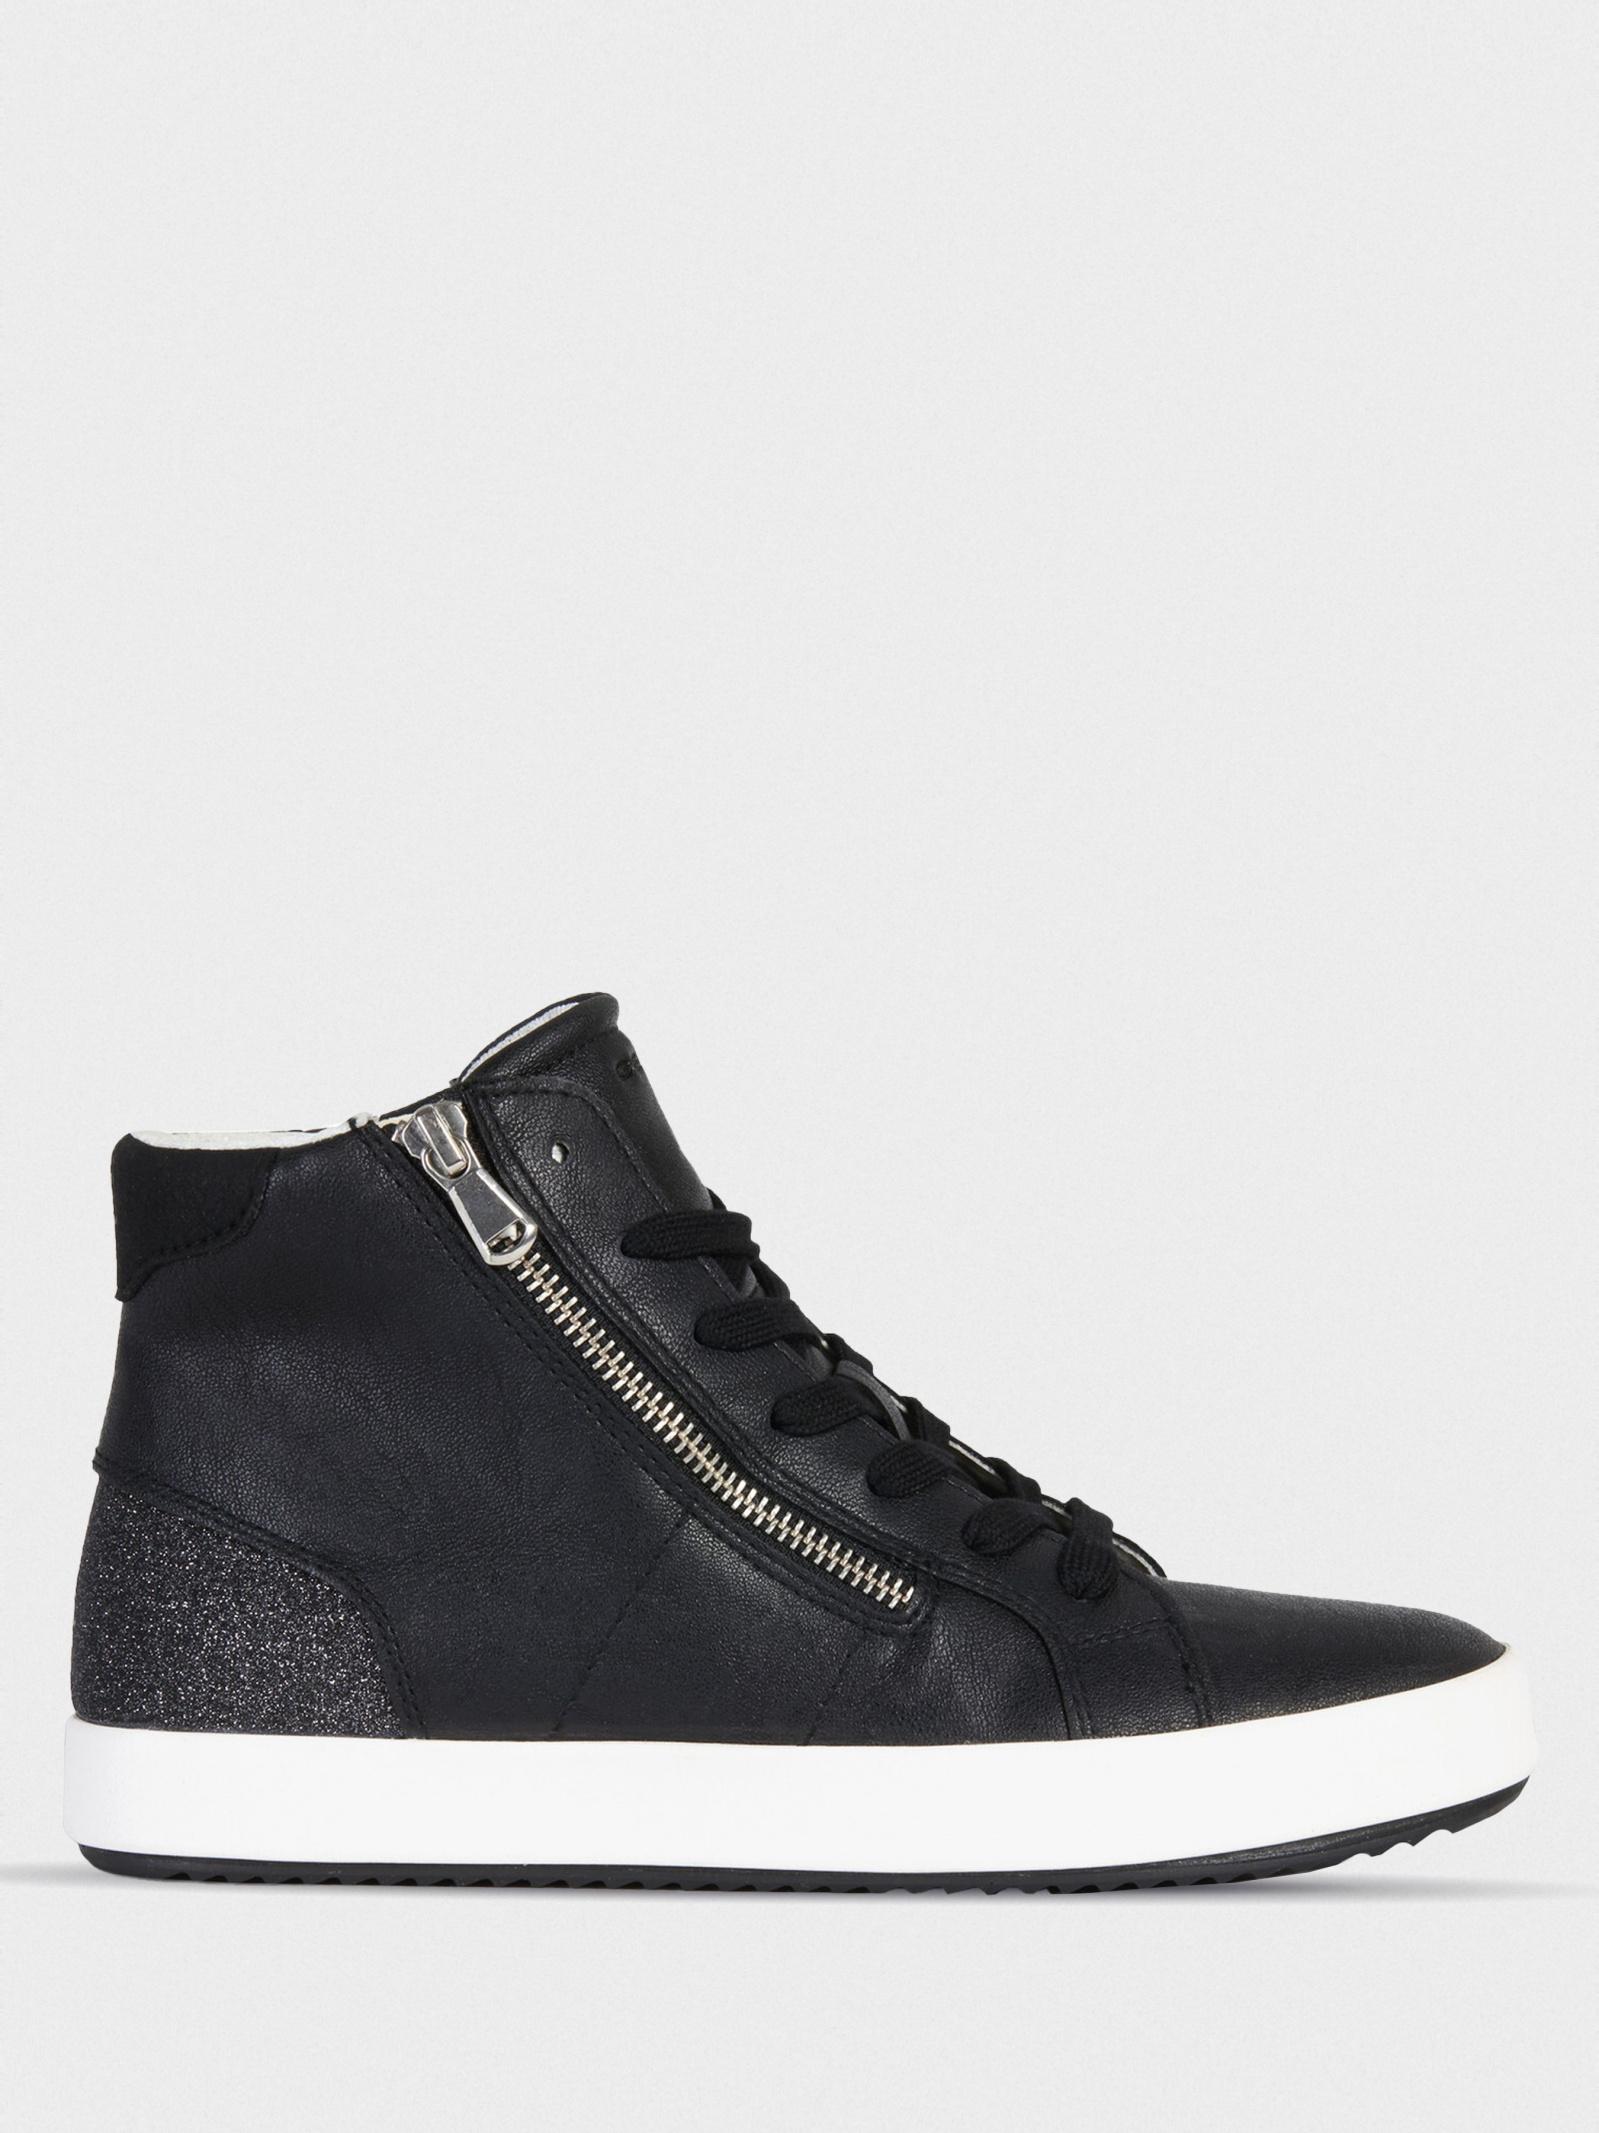 Ботинки для женщин Geox D BLOMIEE XW3792 купить обувь, 2017